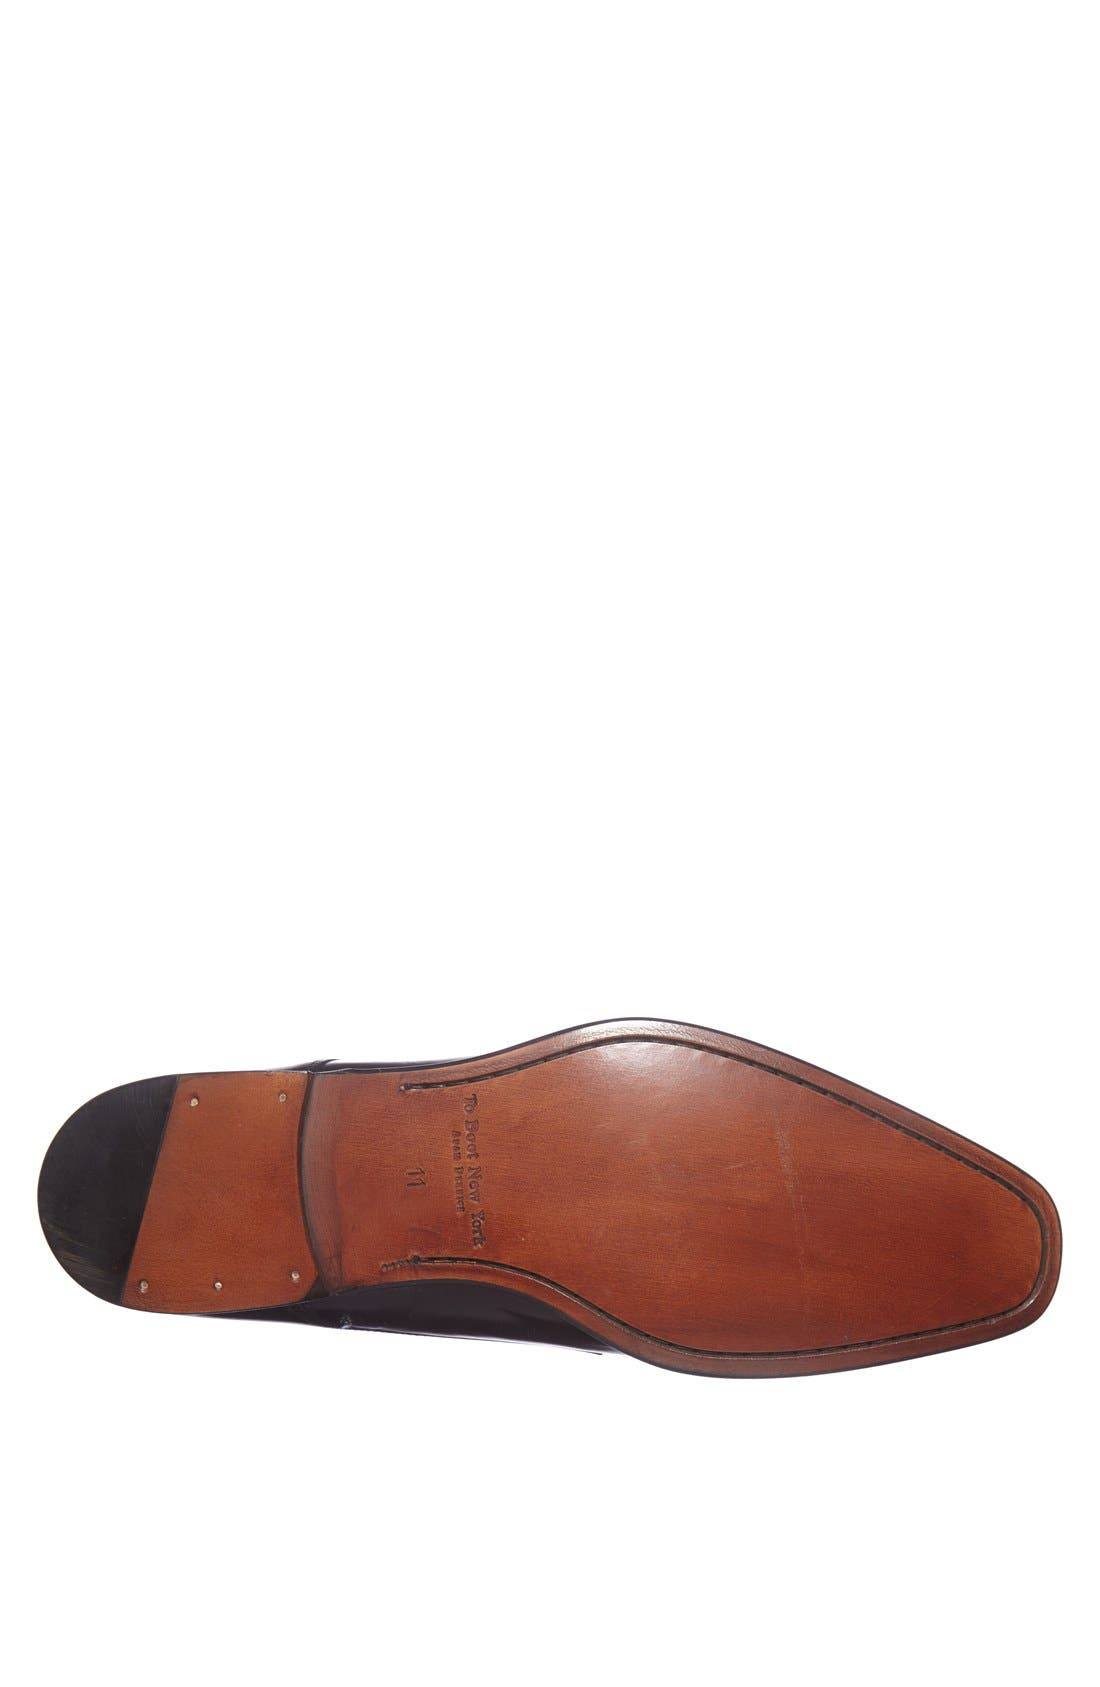 TO BOOT NEW YORK, 'Grant' Double Monk Shoe, Alternate thumbnail 3, color, BLACK CALFSKIN